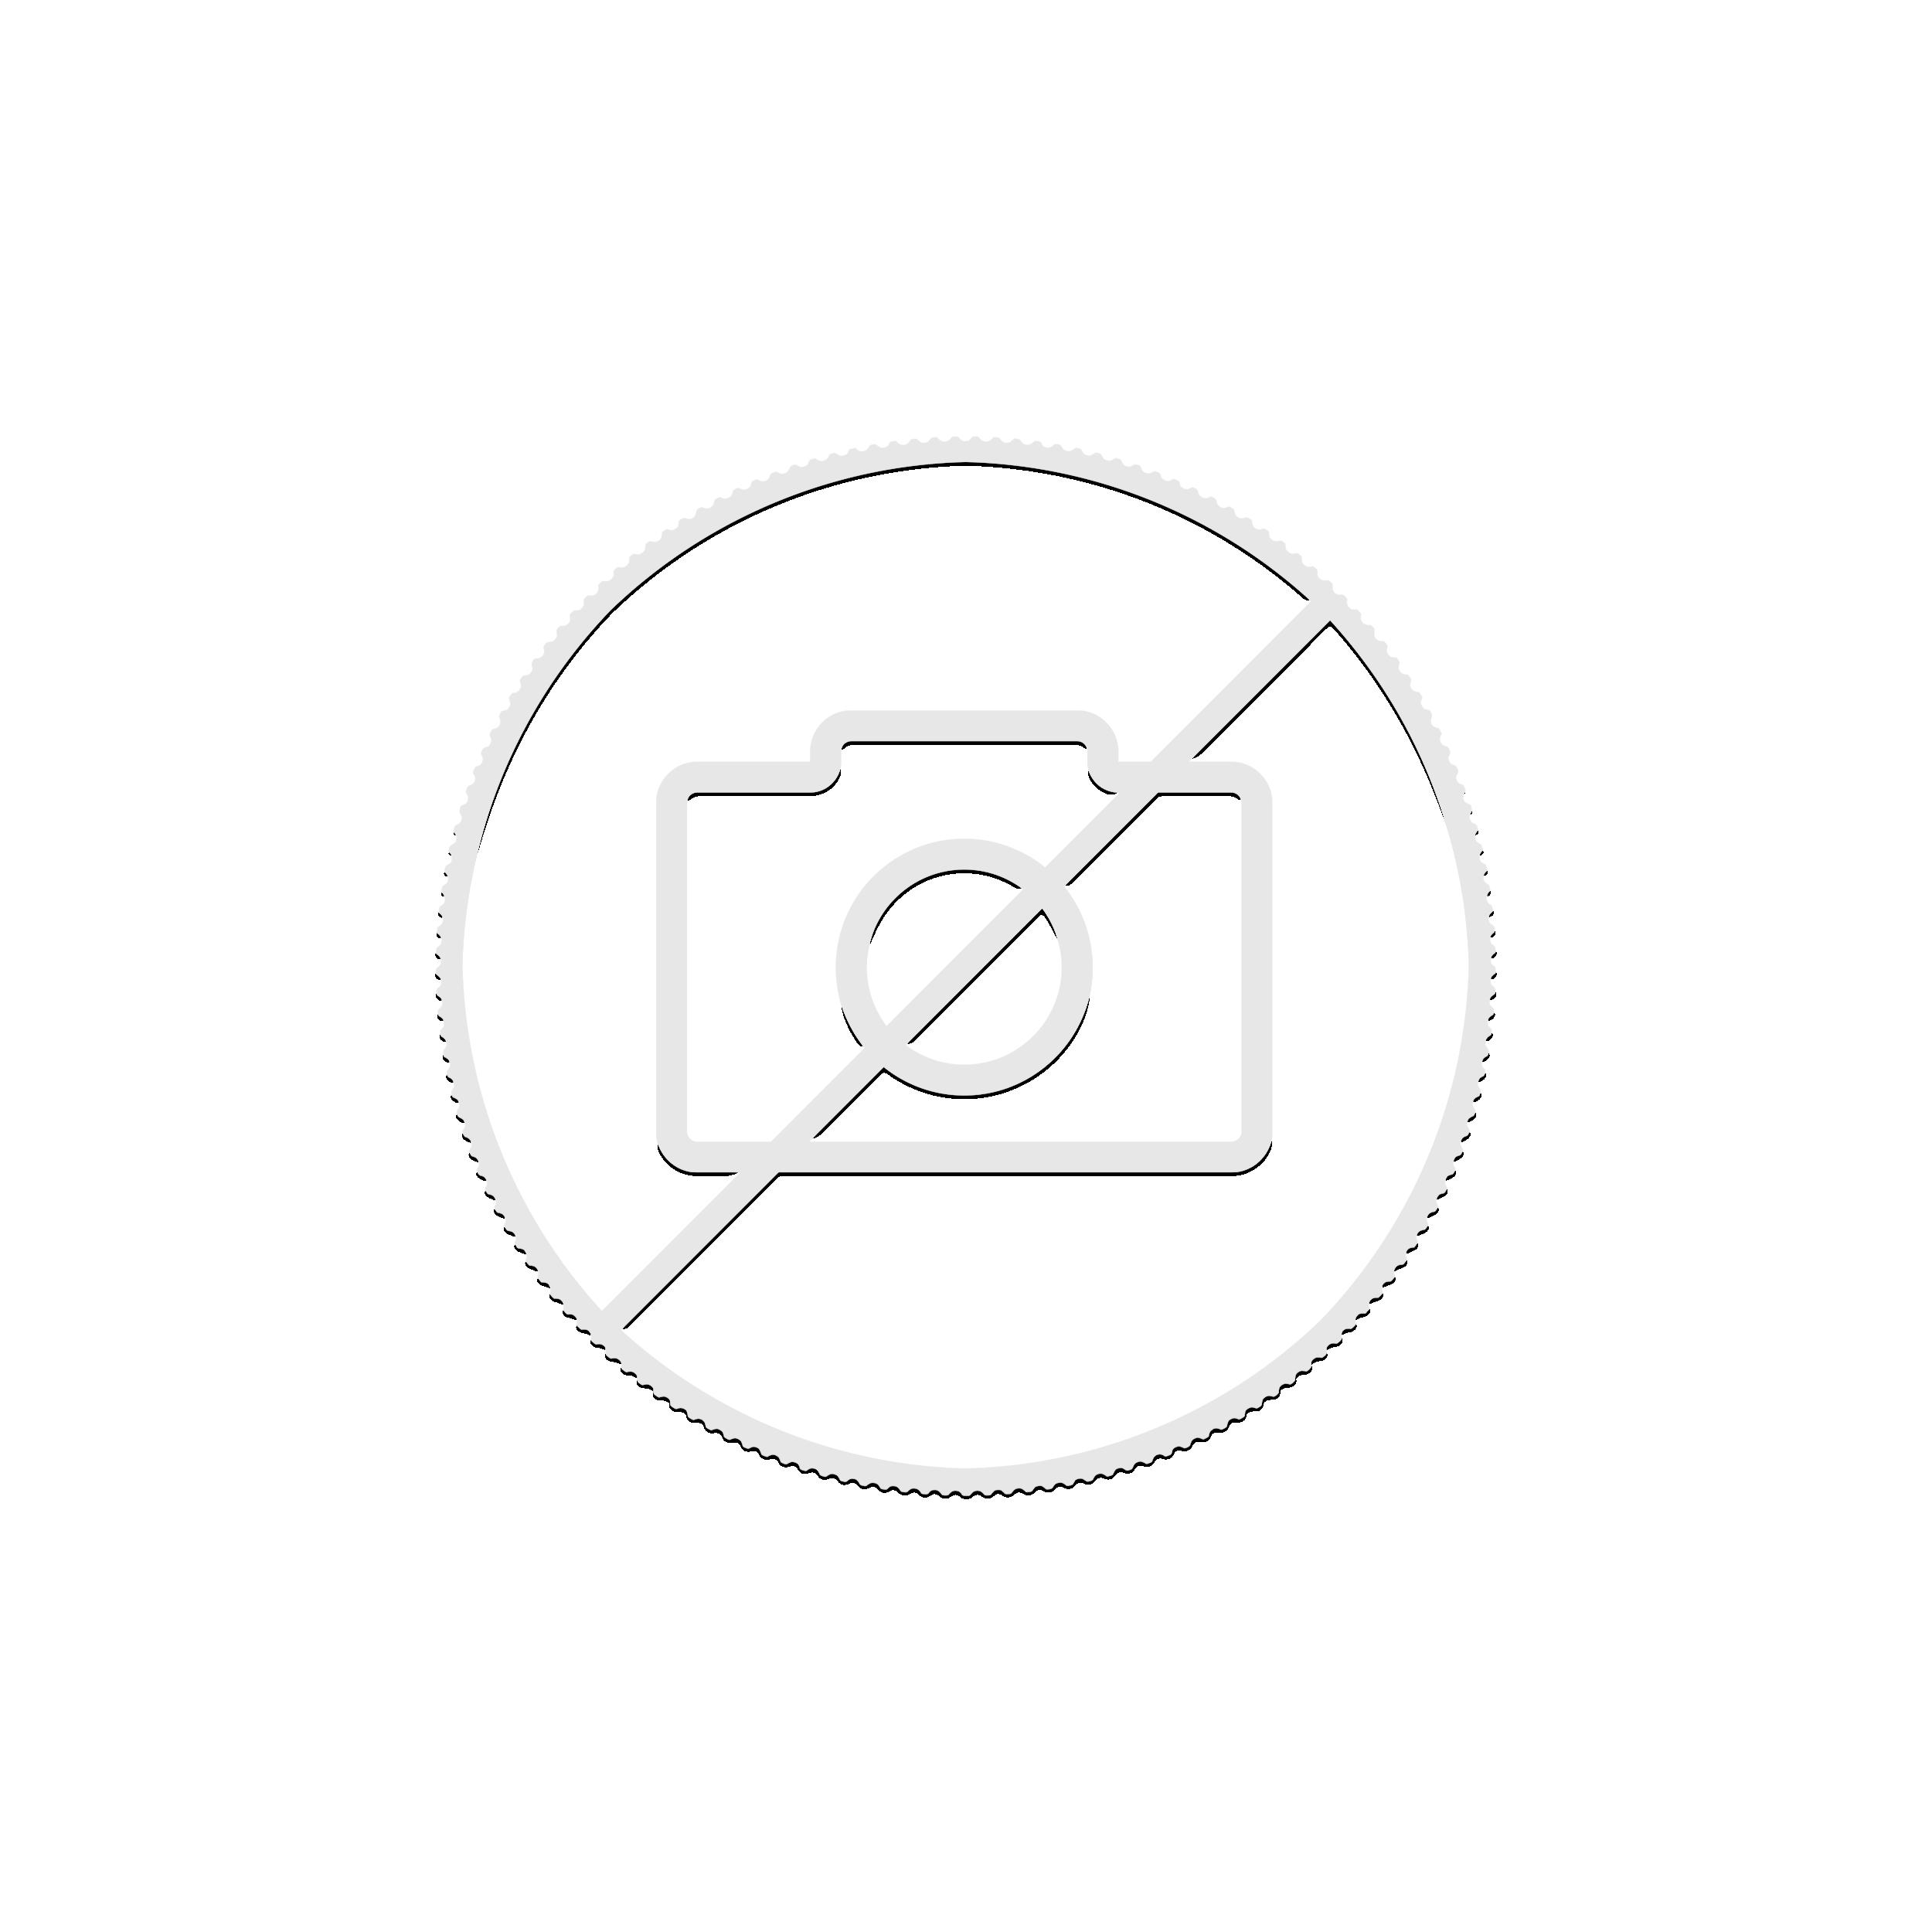 1/10 Troy ounce gold Maple Leaf coin 2019